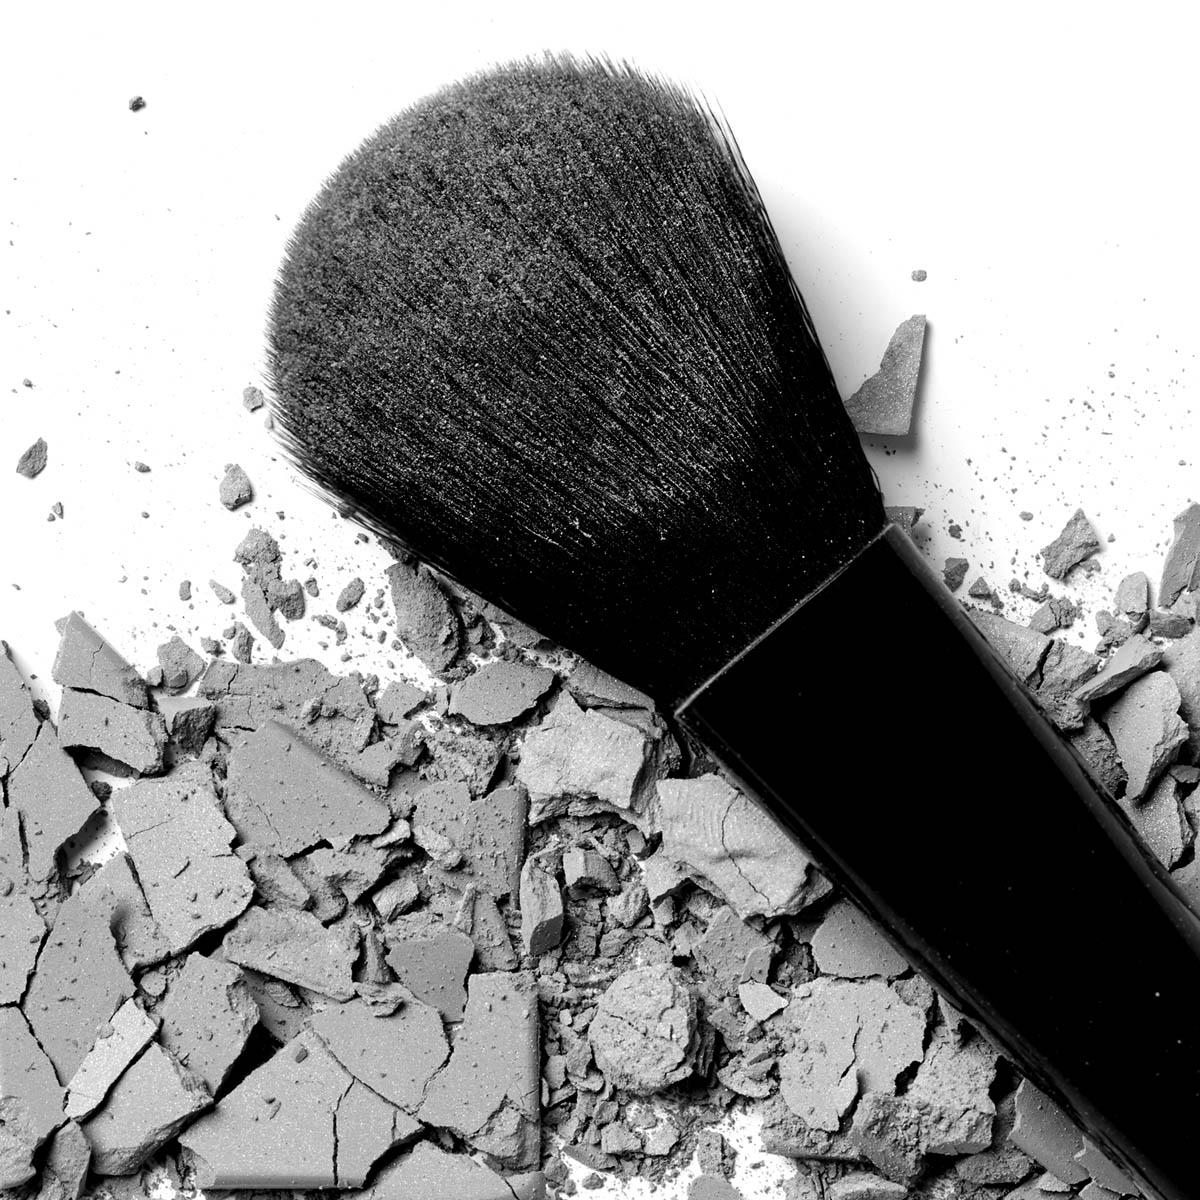 silva Nigra Agentur Beauty Marketing Kosmetik Make Up Healthcare Branchenmarketing Full-Service